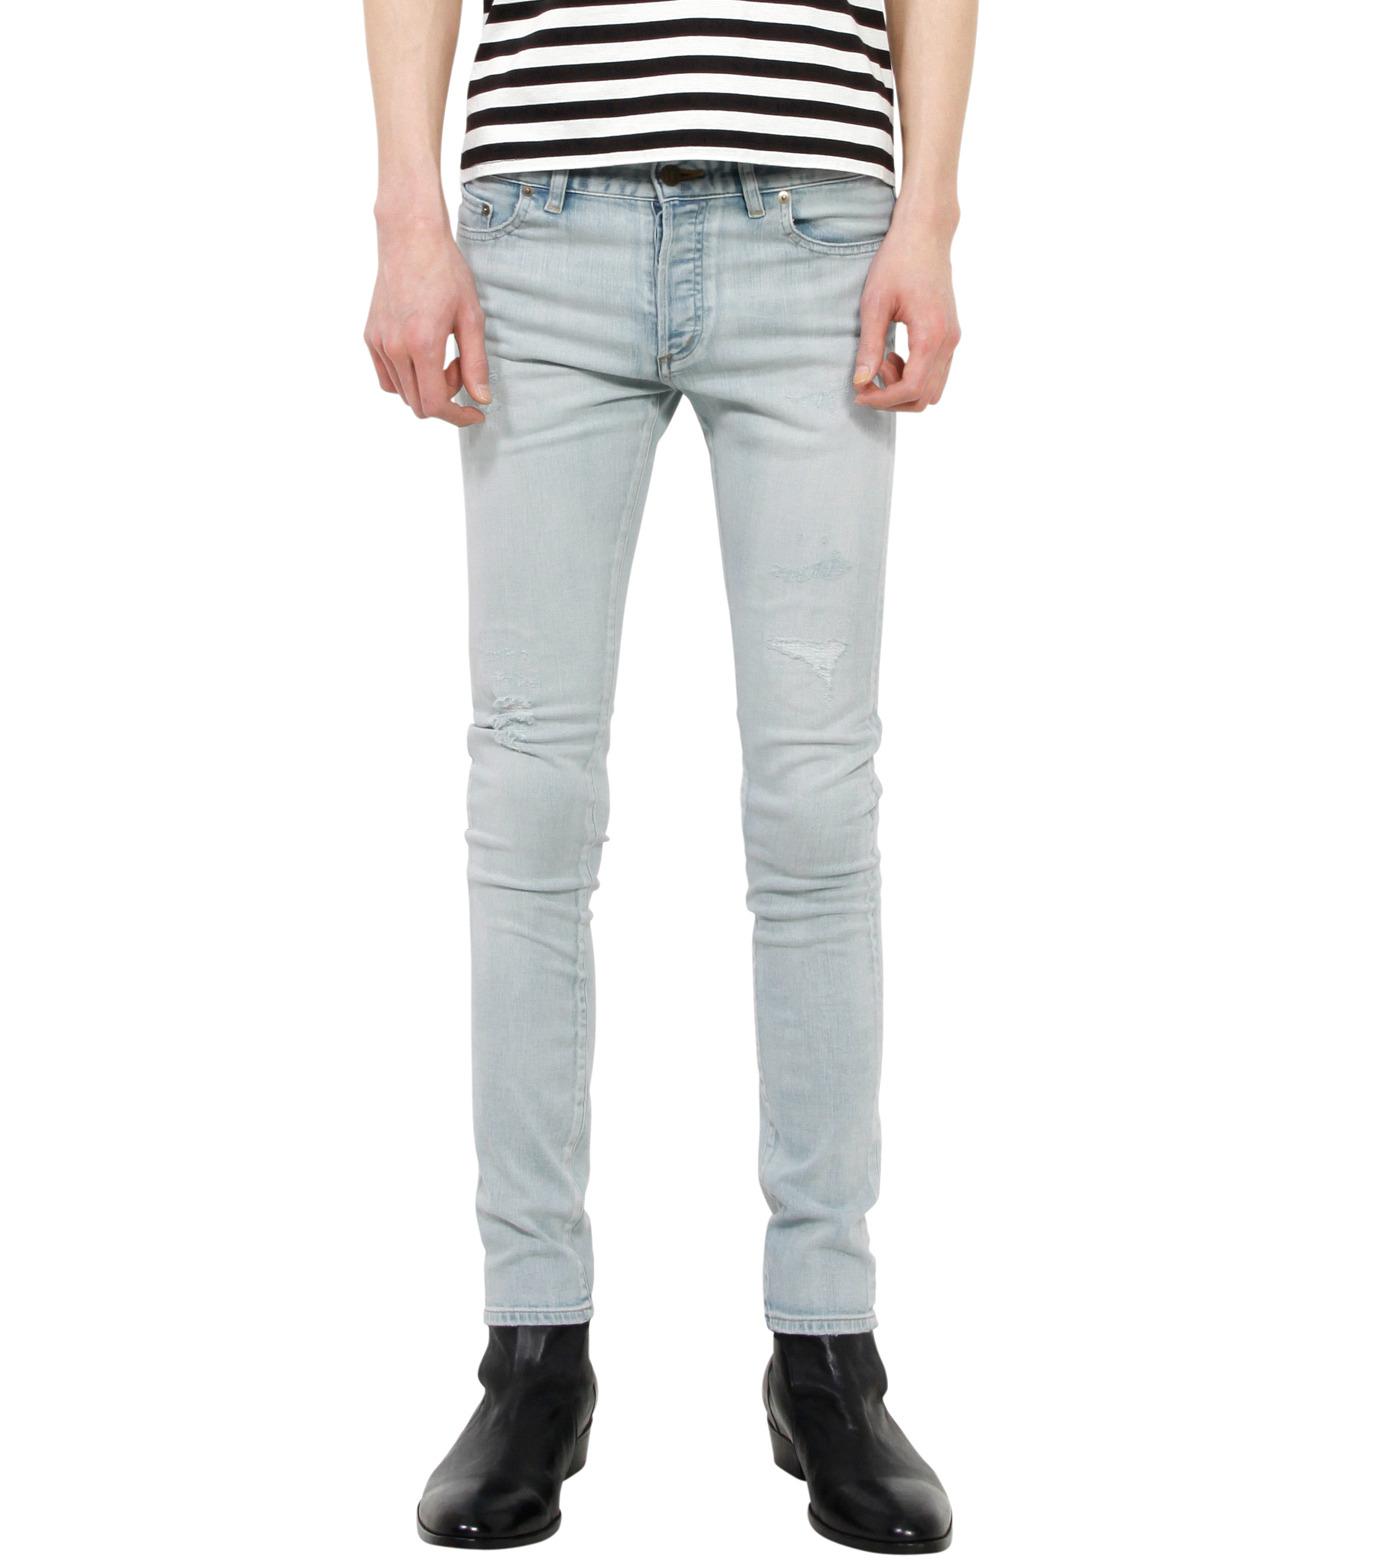 HL HEDDIE LOVU(エイチエル・エディールーヴ)のbleach skin slim-LIGHT BLUE(パンツ/pants)-18S98001-91 拡大詳細画像1